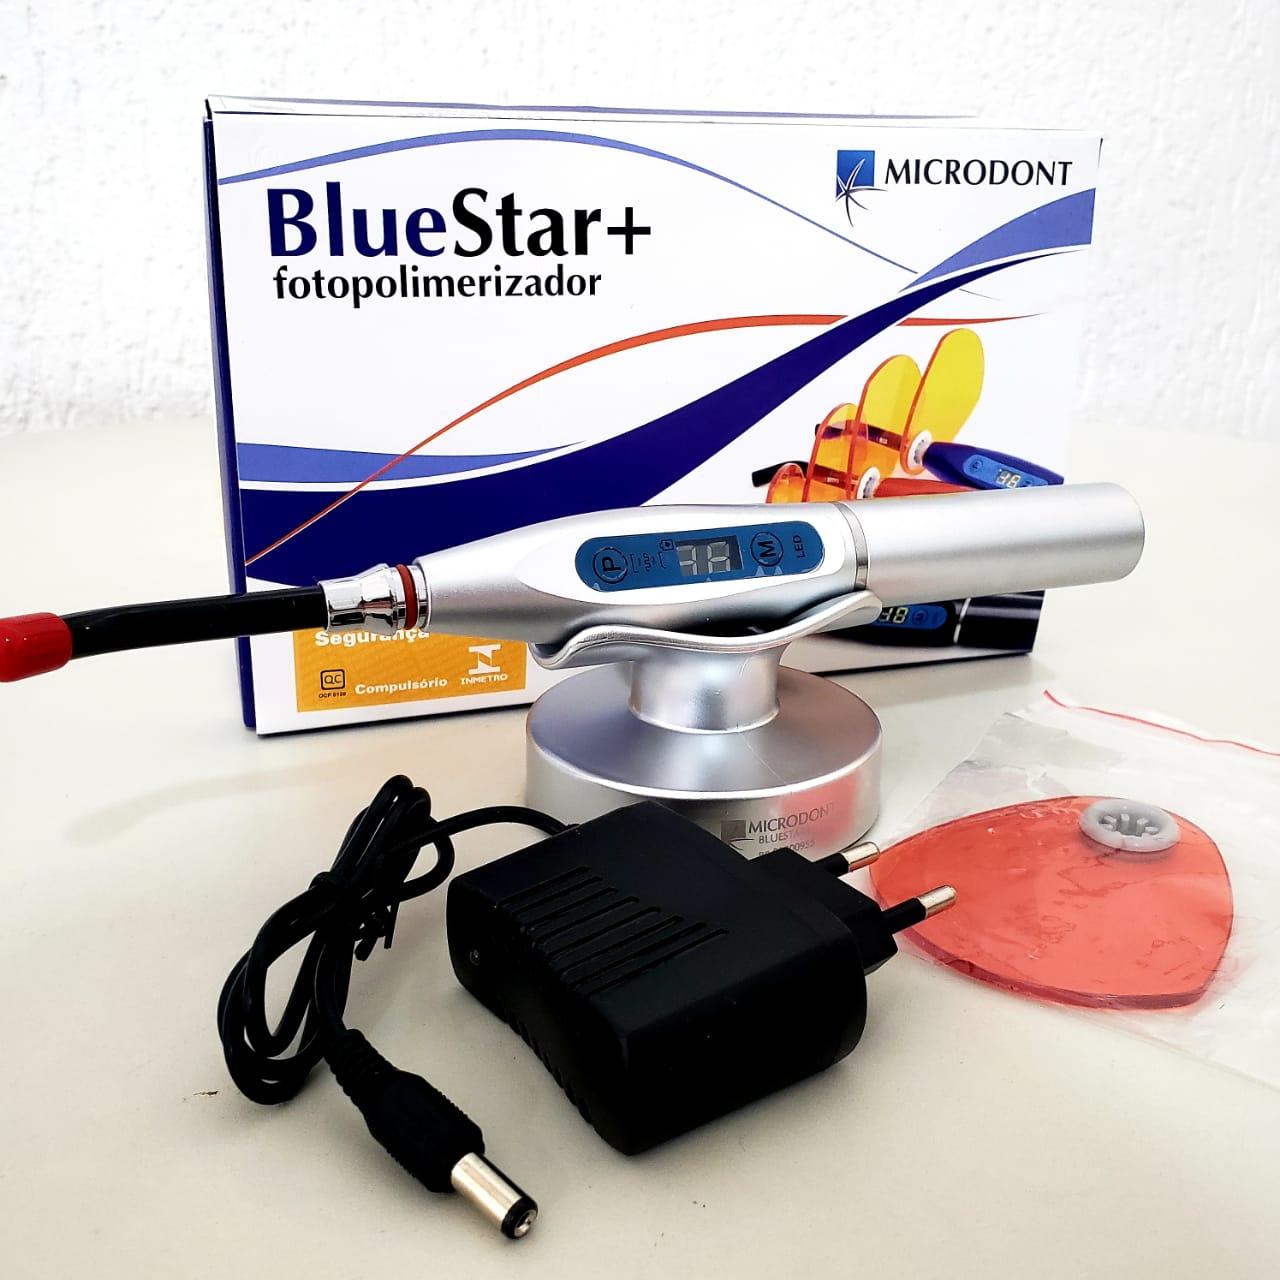 Fotopolimerizador BlueStar + - Microdont